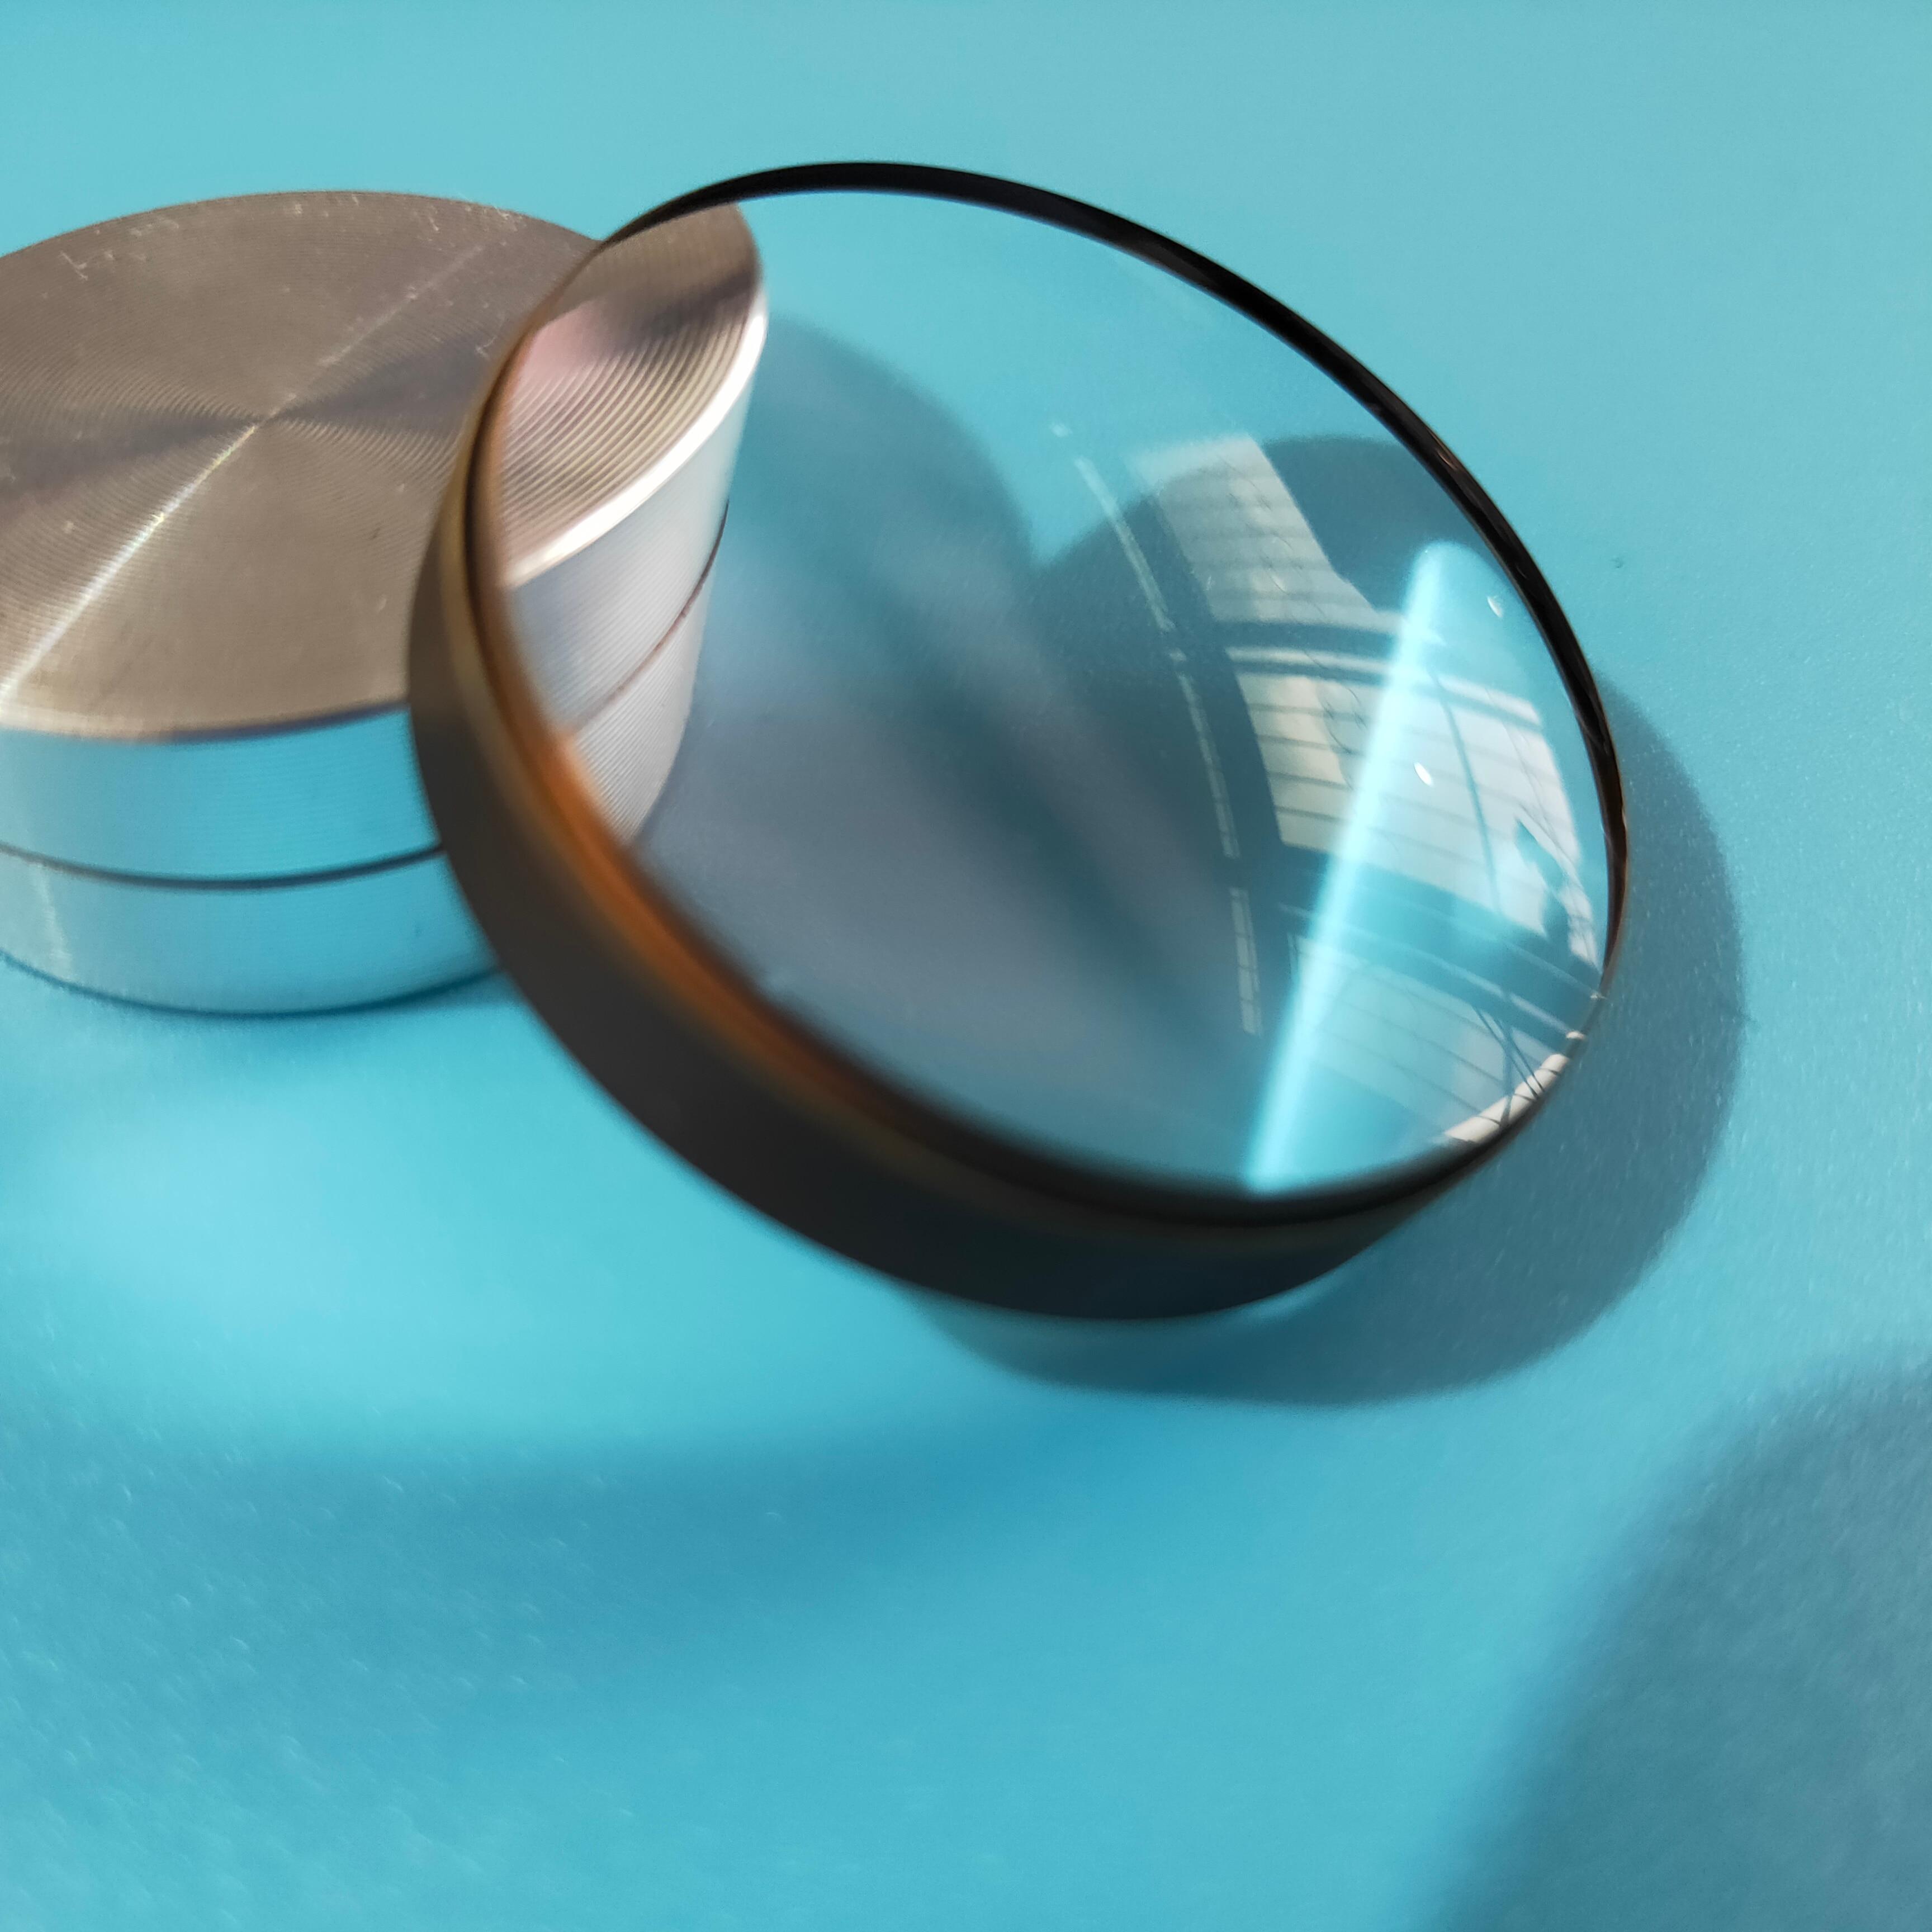 Glued Lens Achromatic 35mm Diameter, Focal Length 110mm Manufacturers Supply Processing Custom Optical Glass